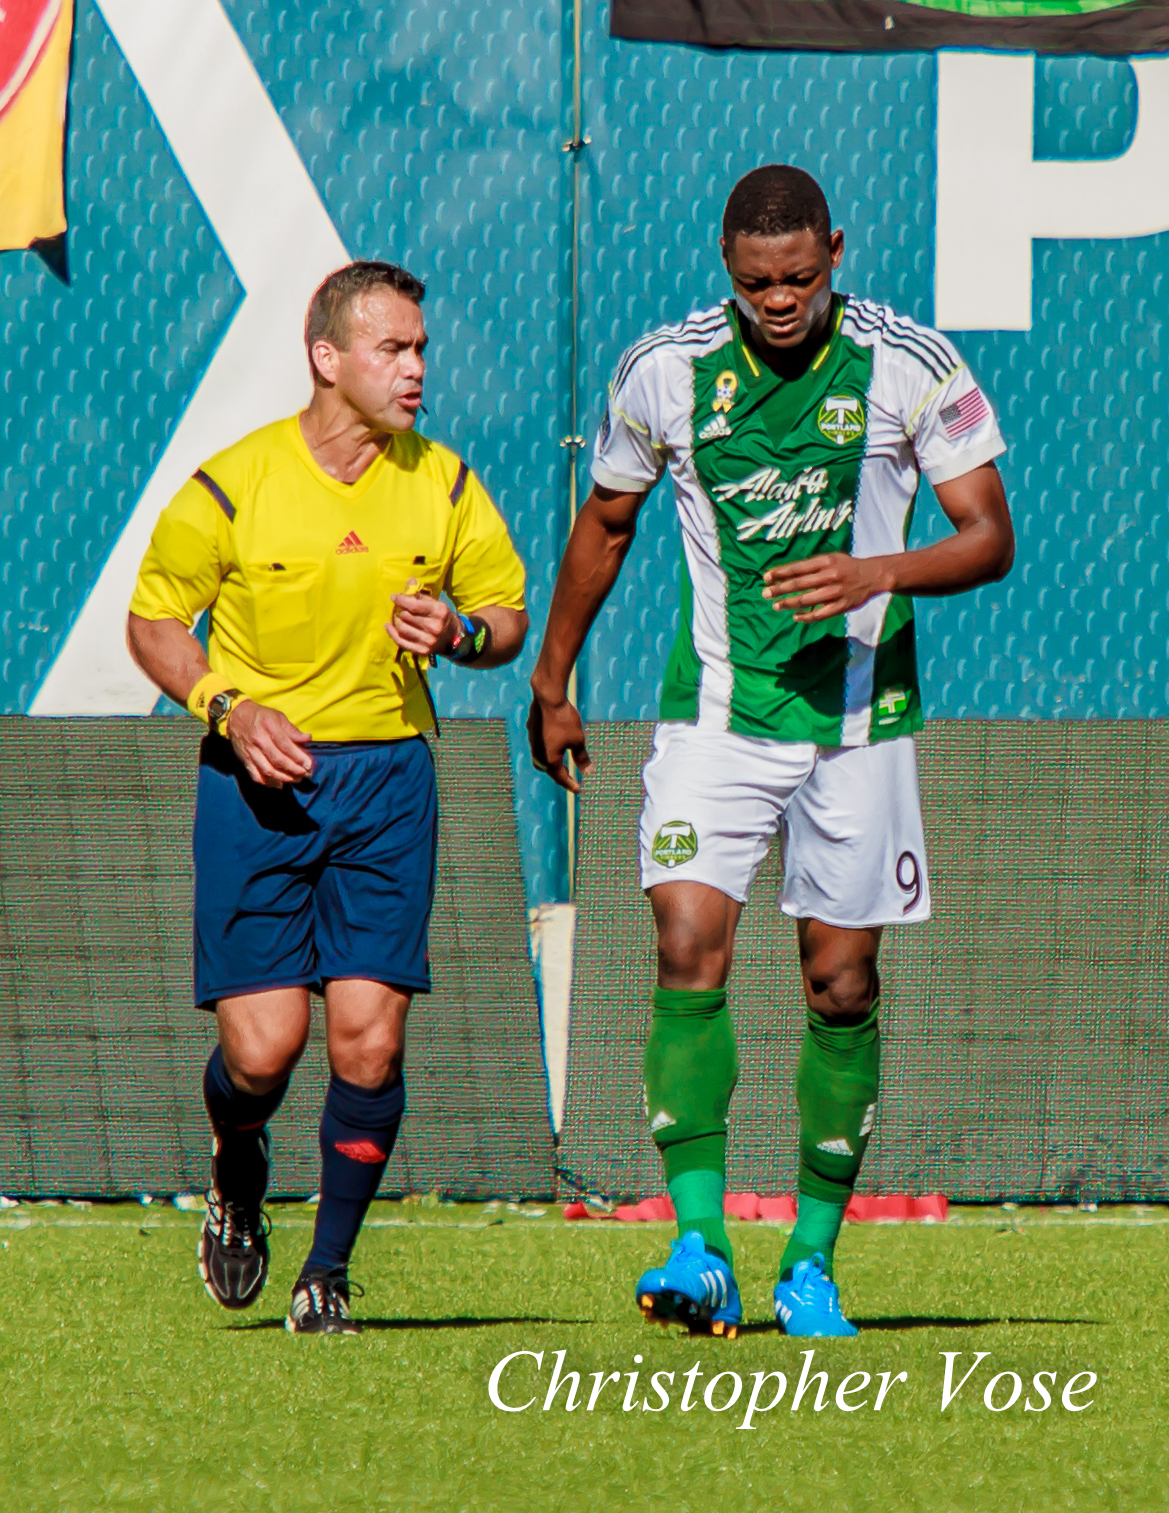 2014-09-20 Fanendo Adi's First Goal Celebration.jpg